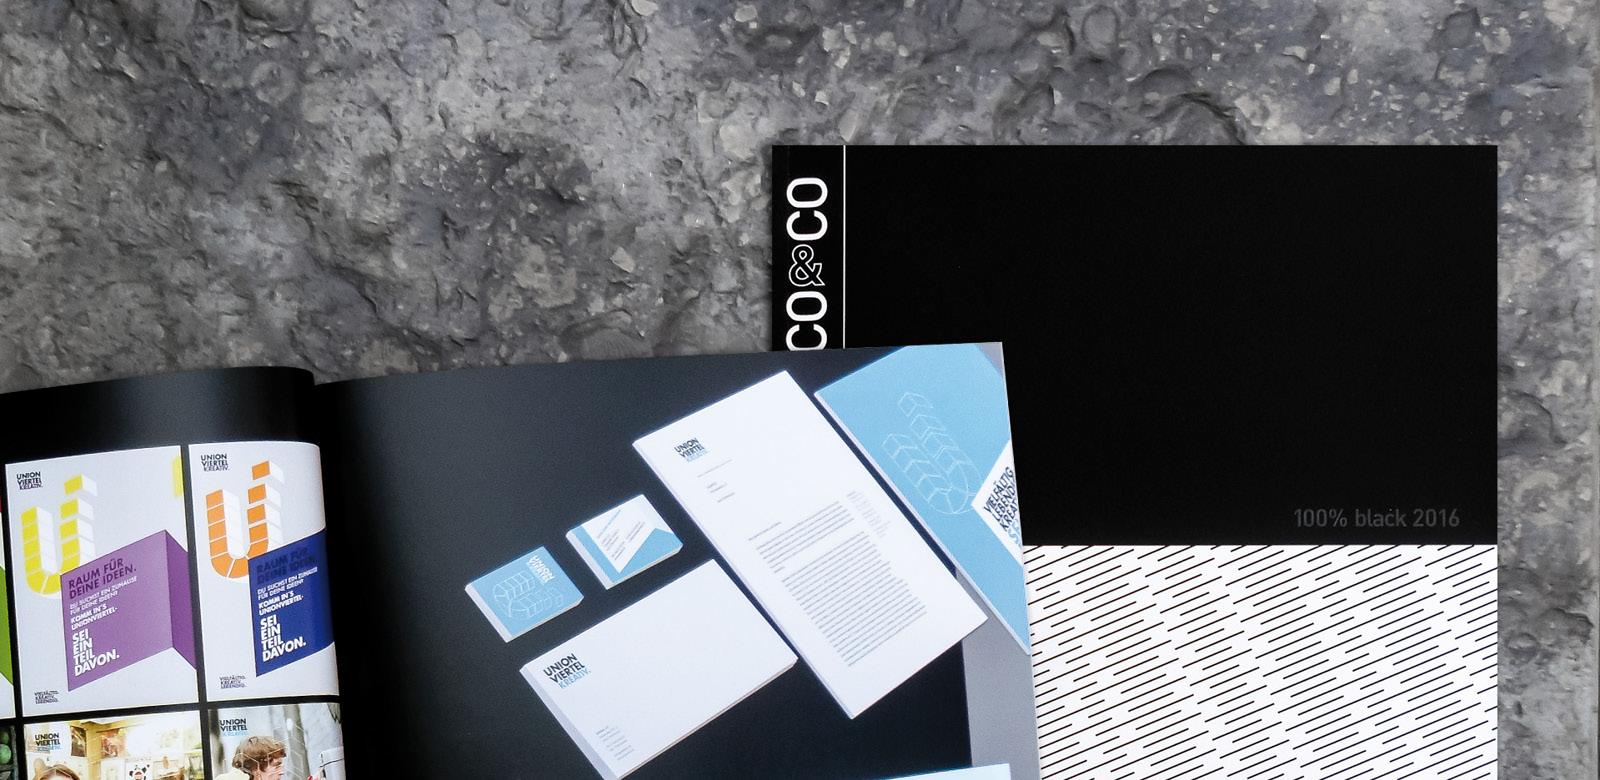 100% black 2016 Cover